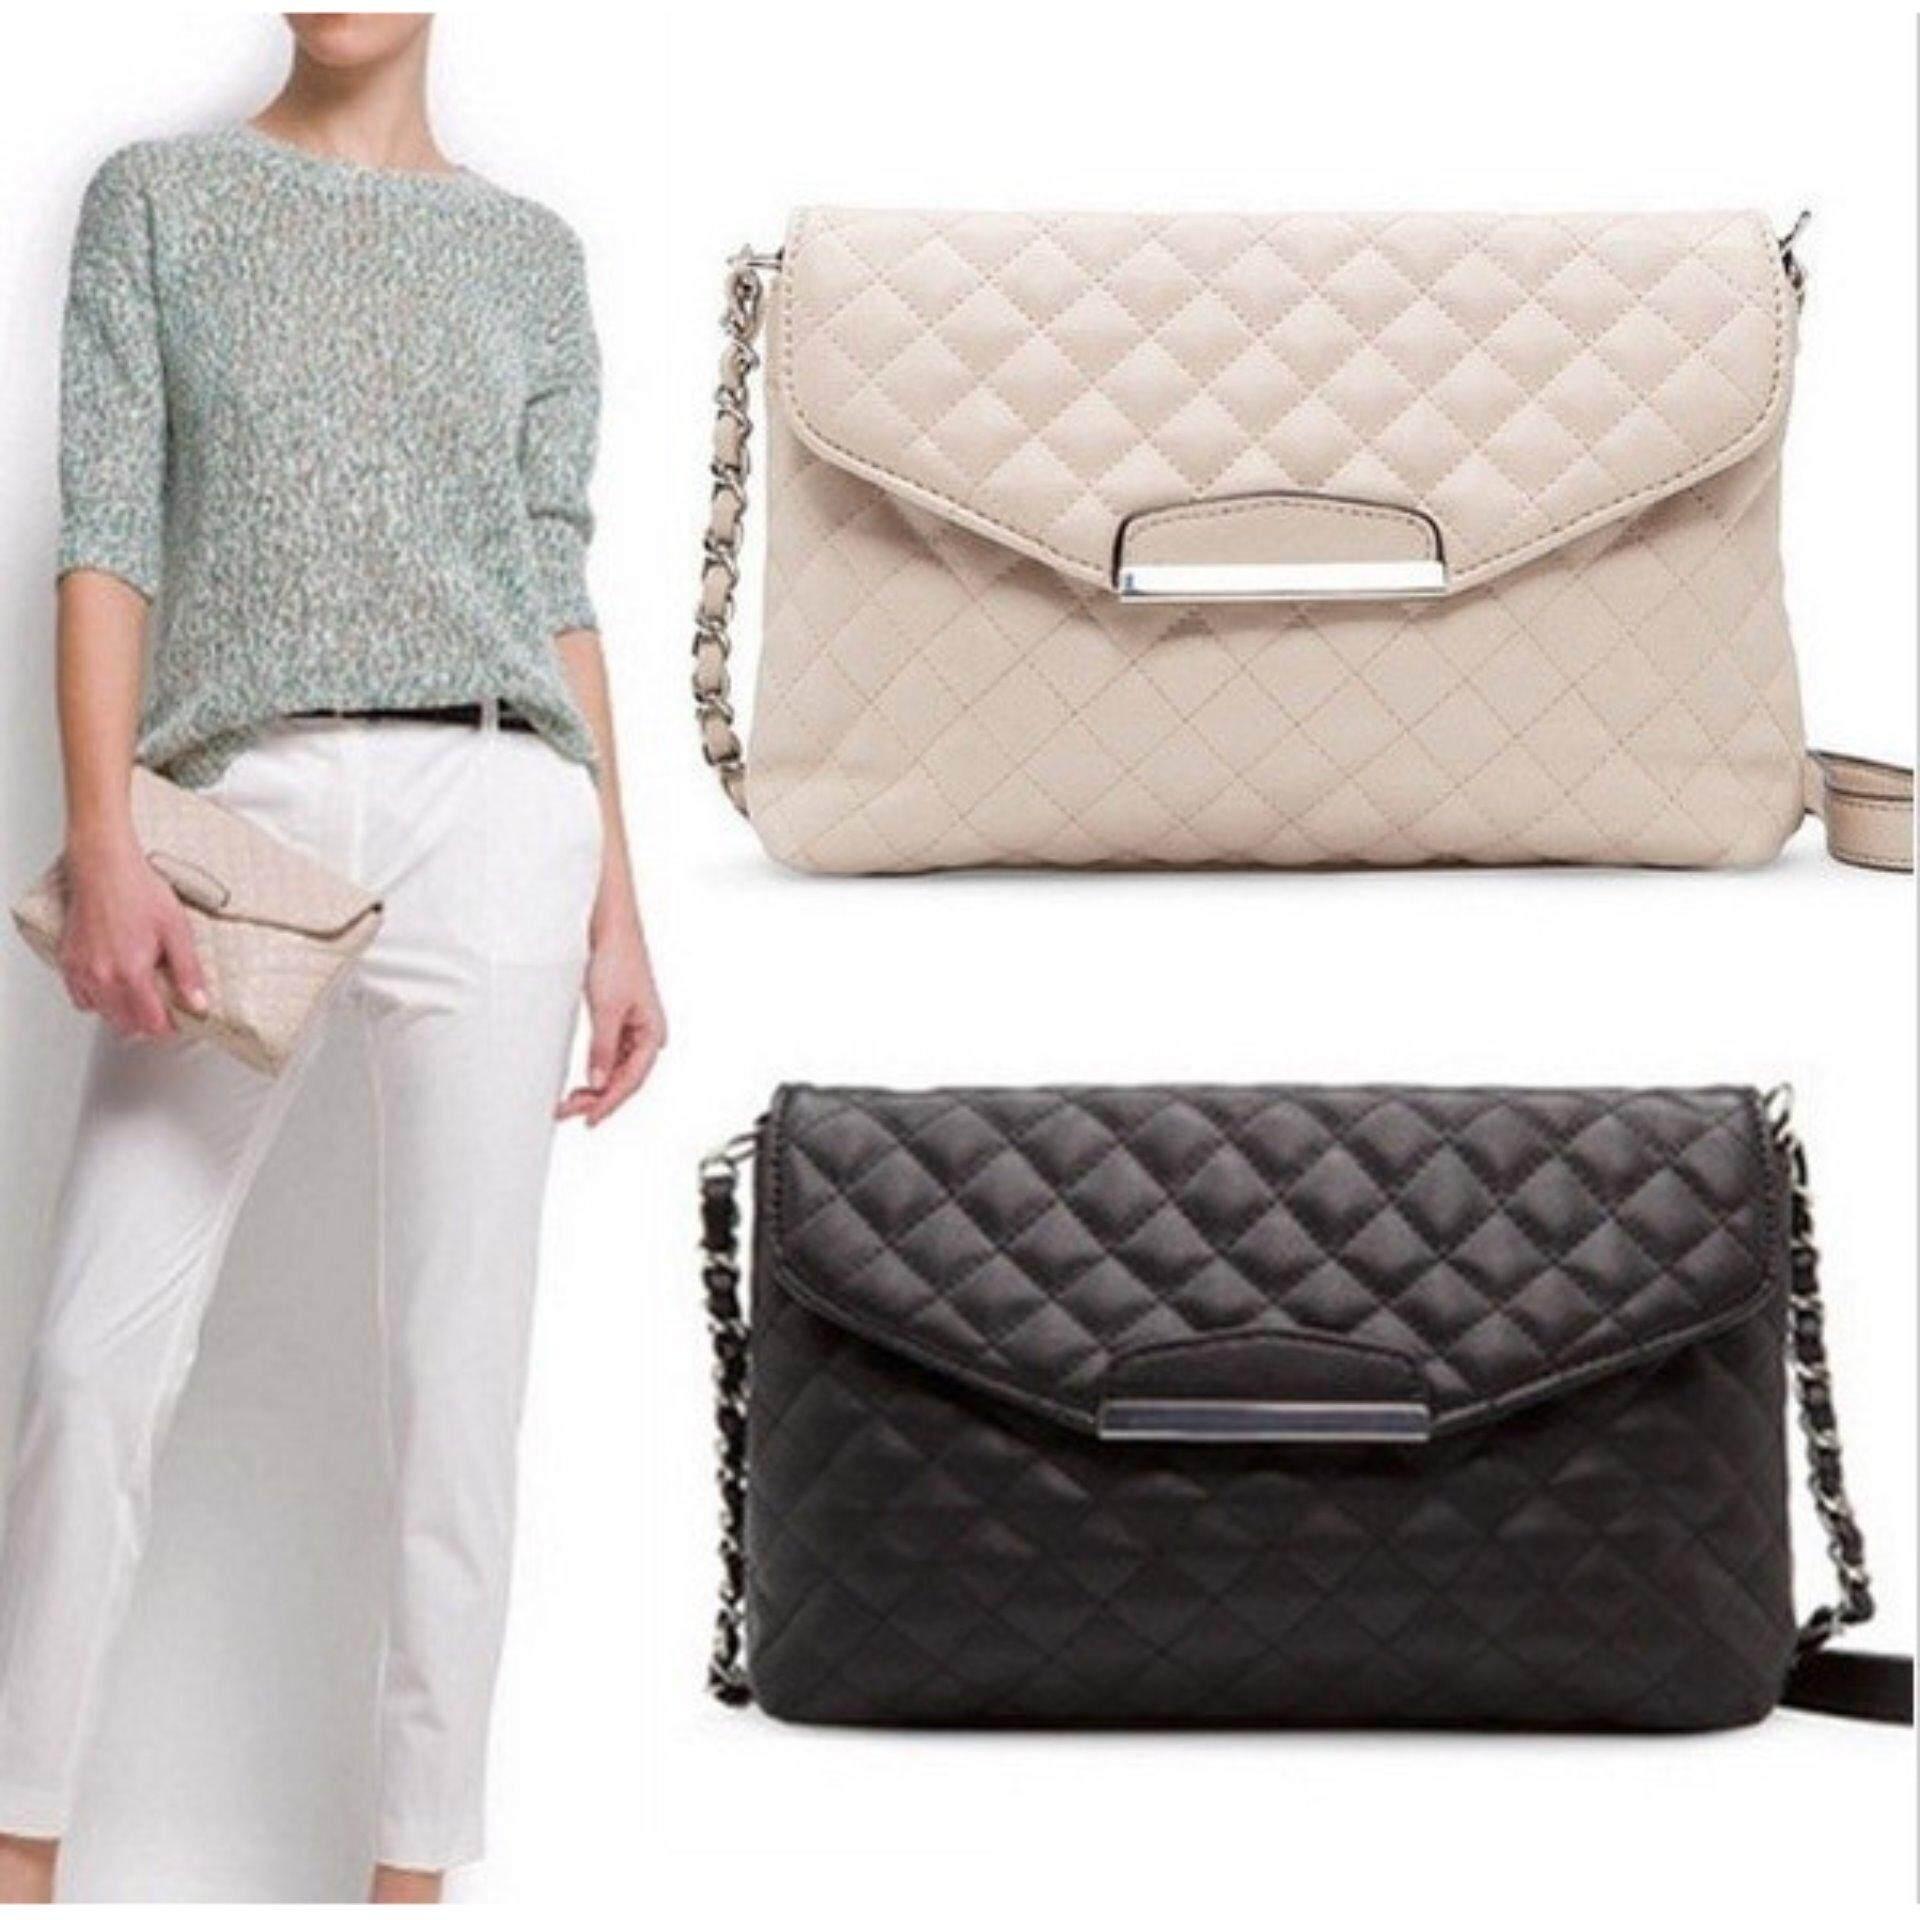 Clearance Sale Below Cost - Mango Cross Messenger Leather handbag- White - FREE SHIPPING